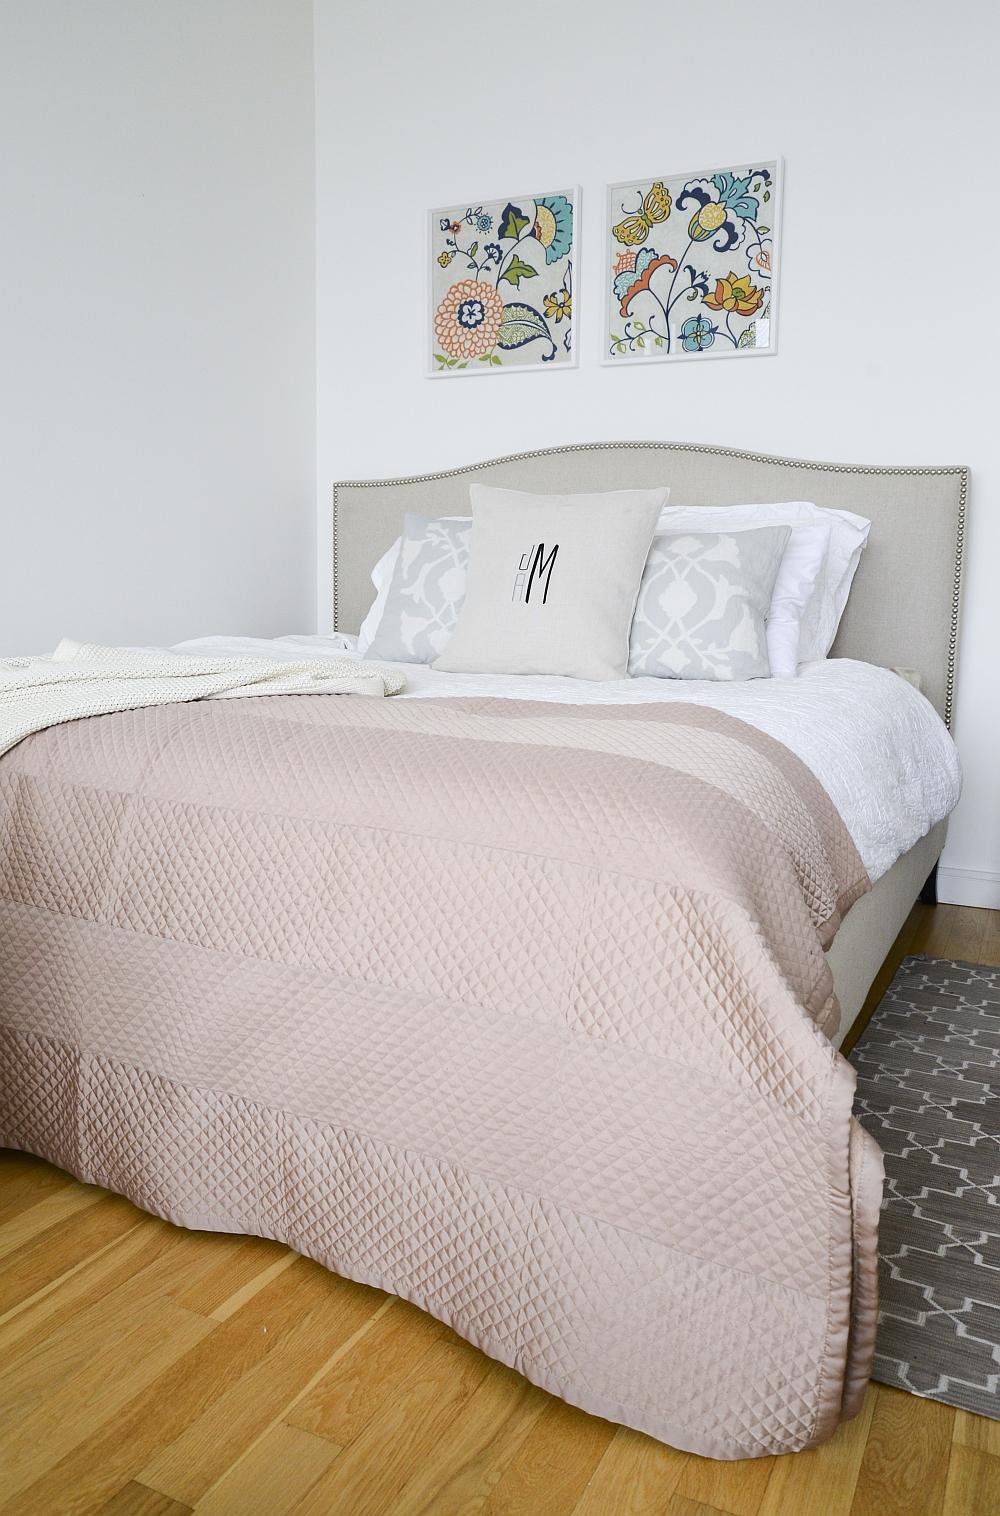 Relaxing bedroom design in white